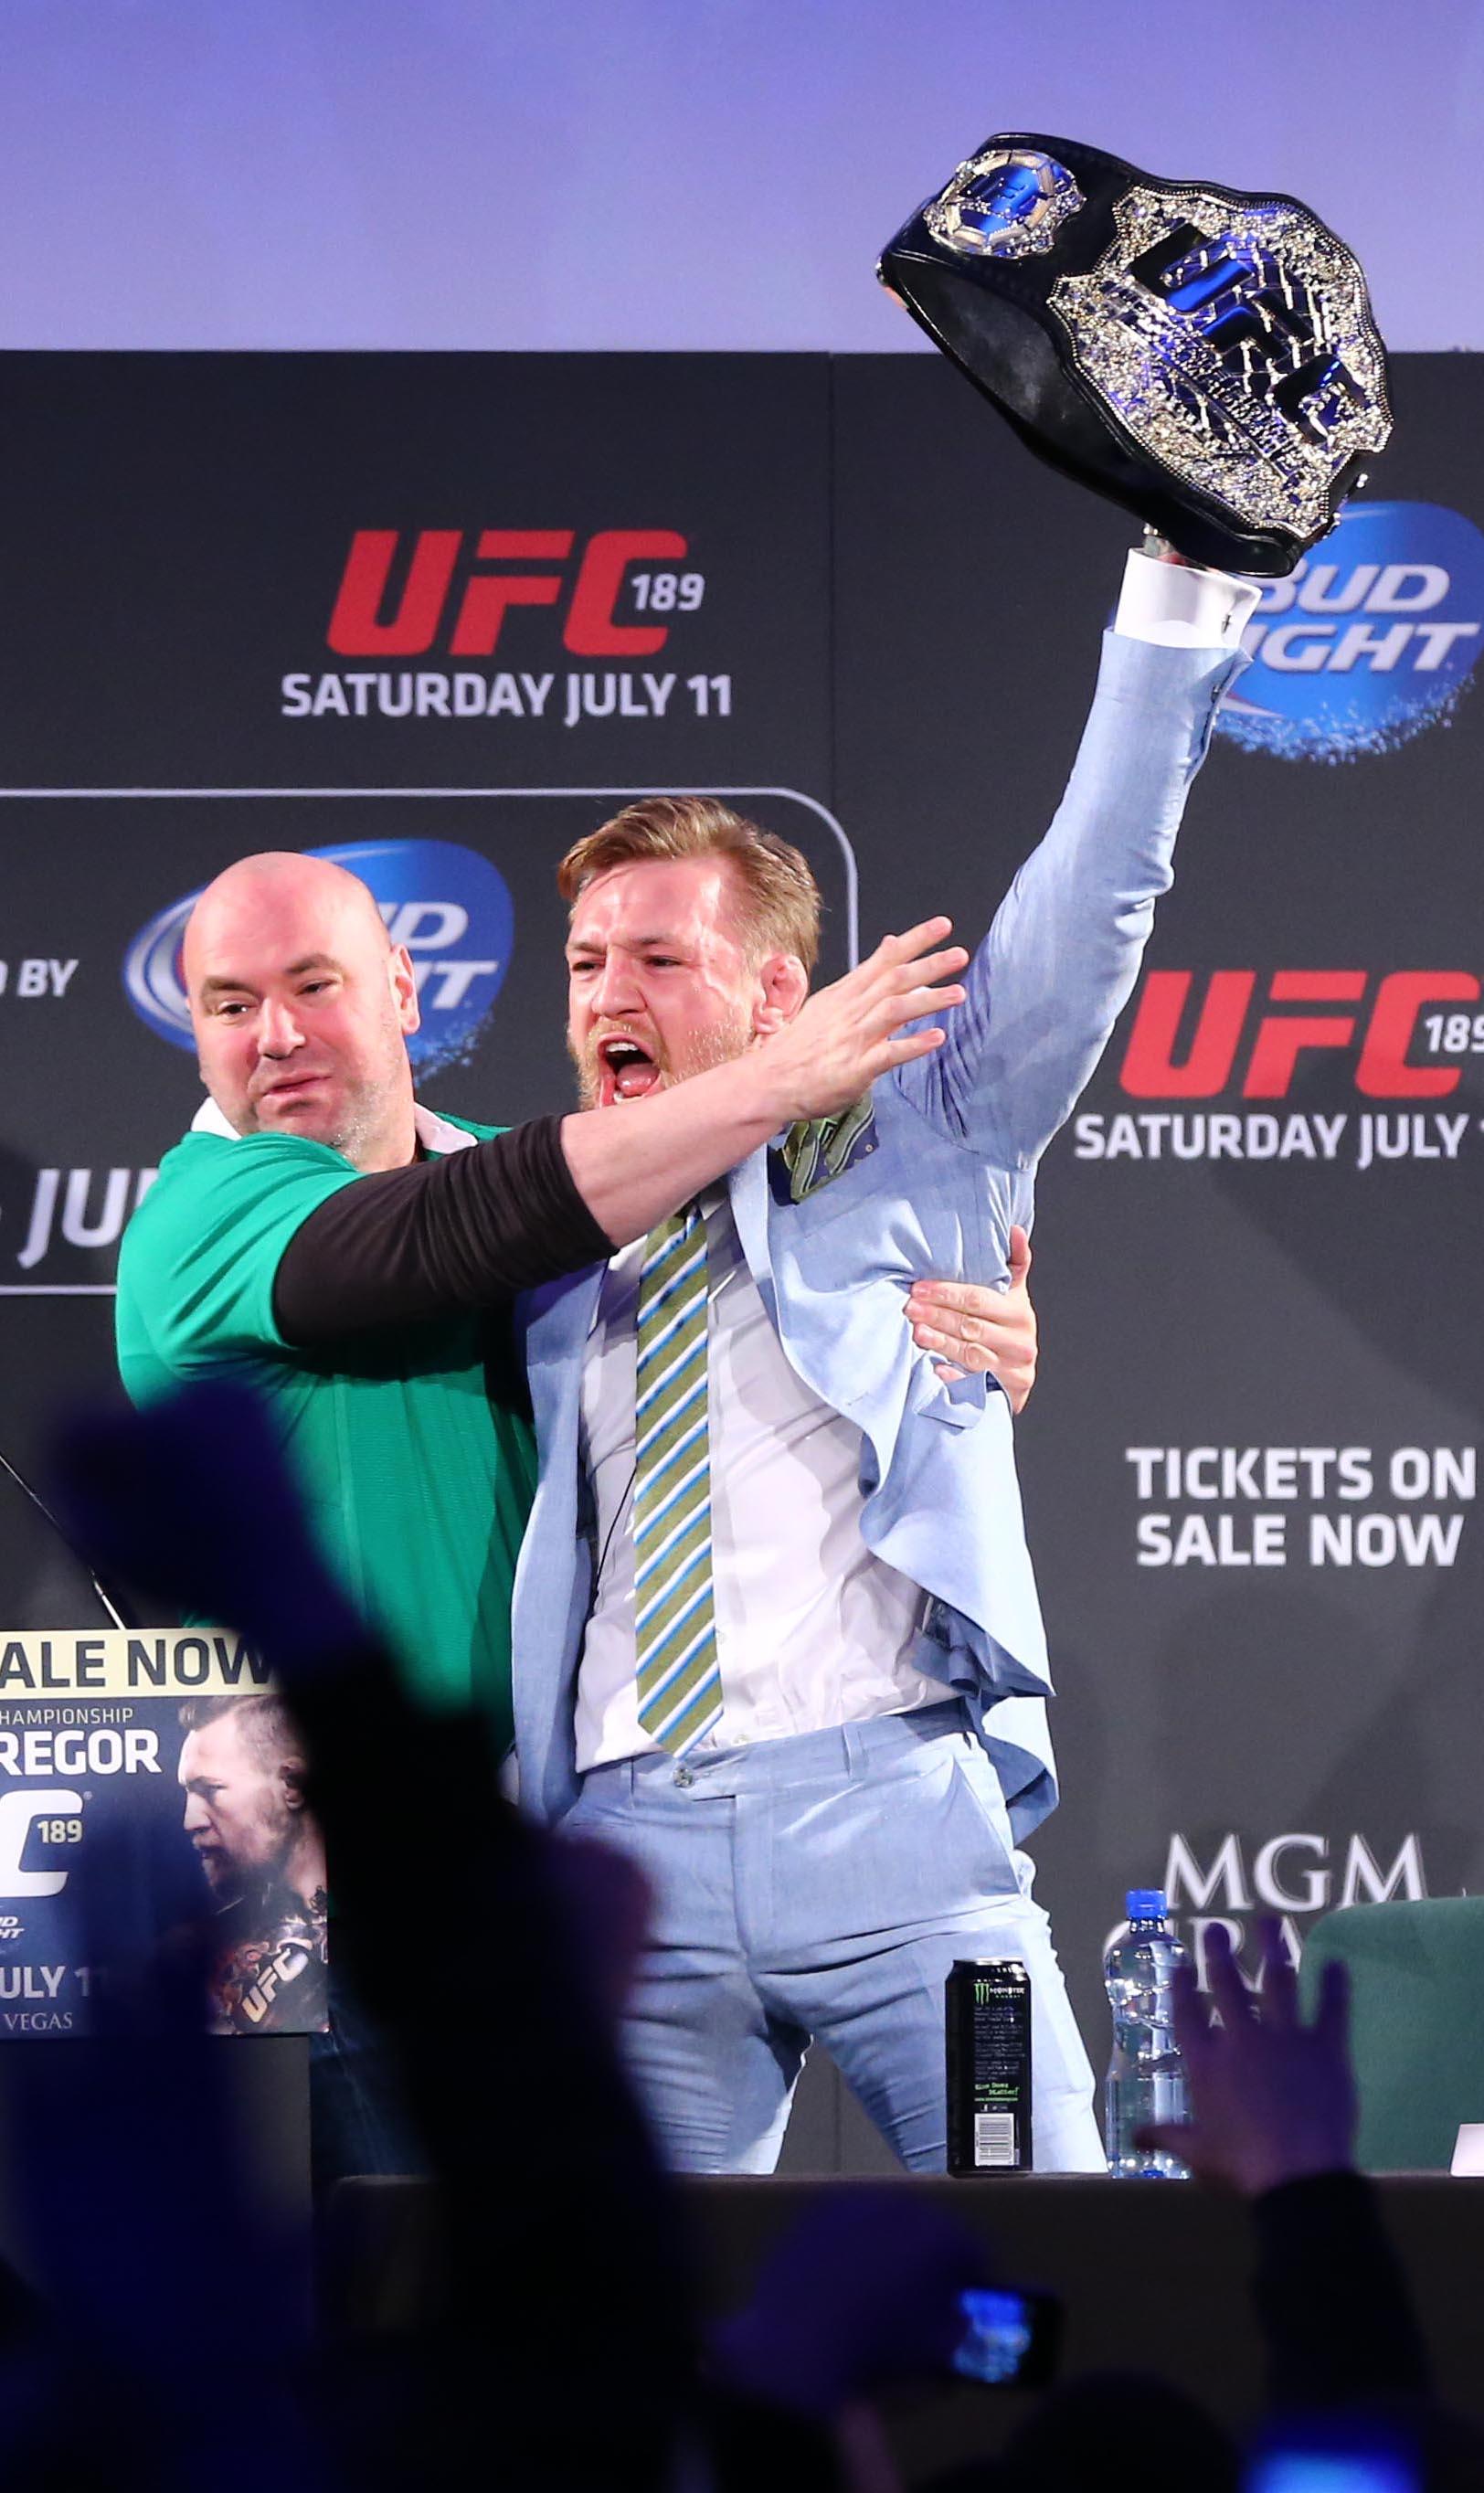 inpho 00916361 20 Craziest Conor McGregor Moments